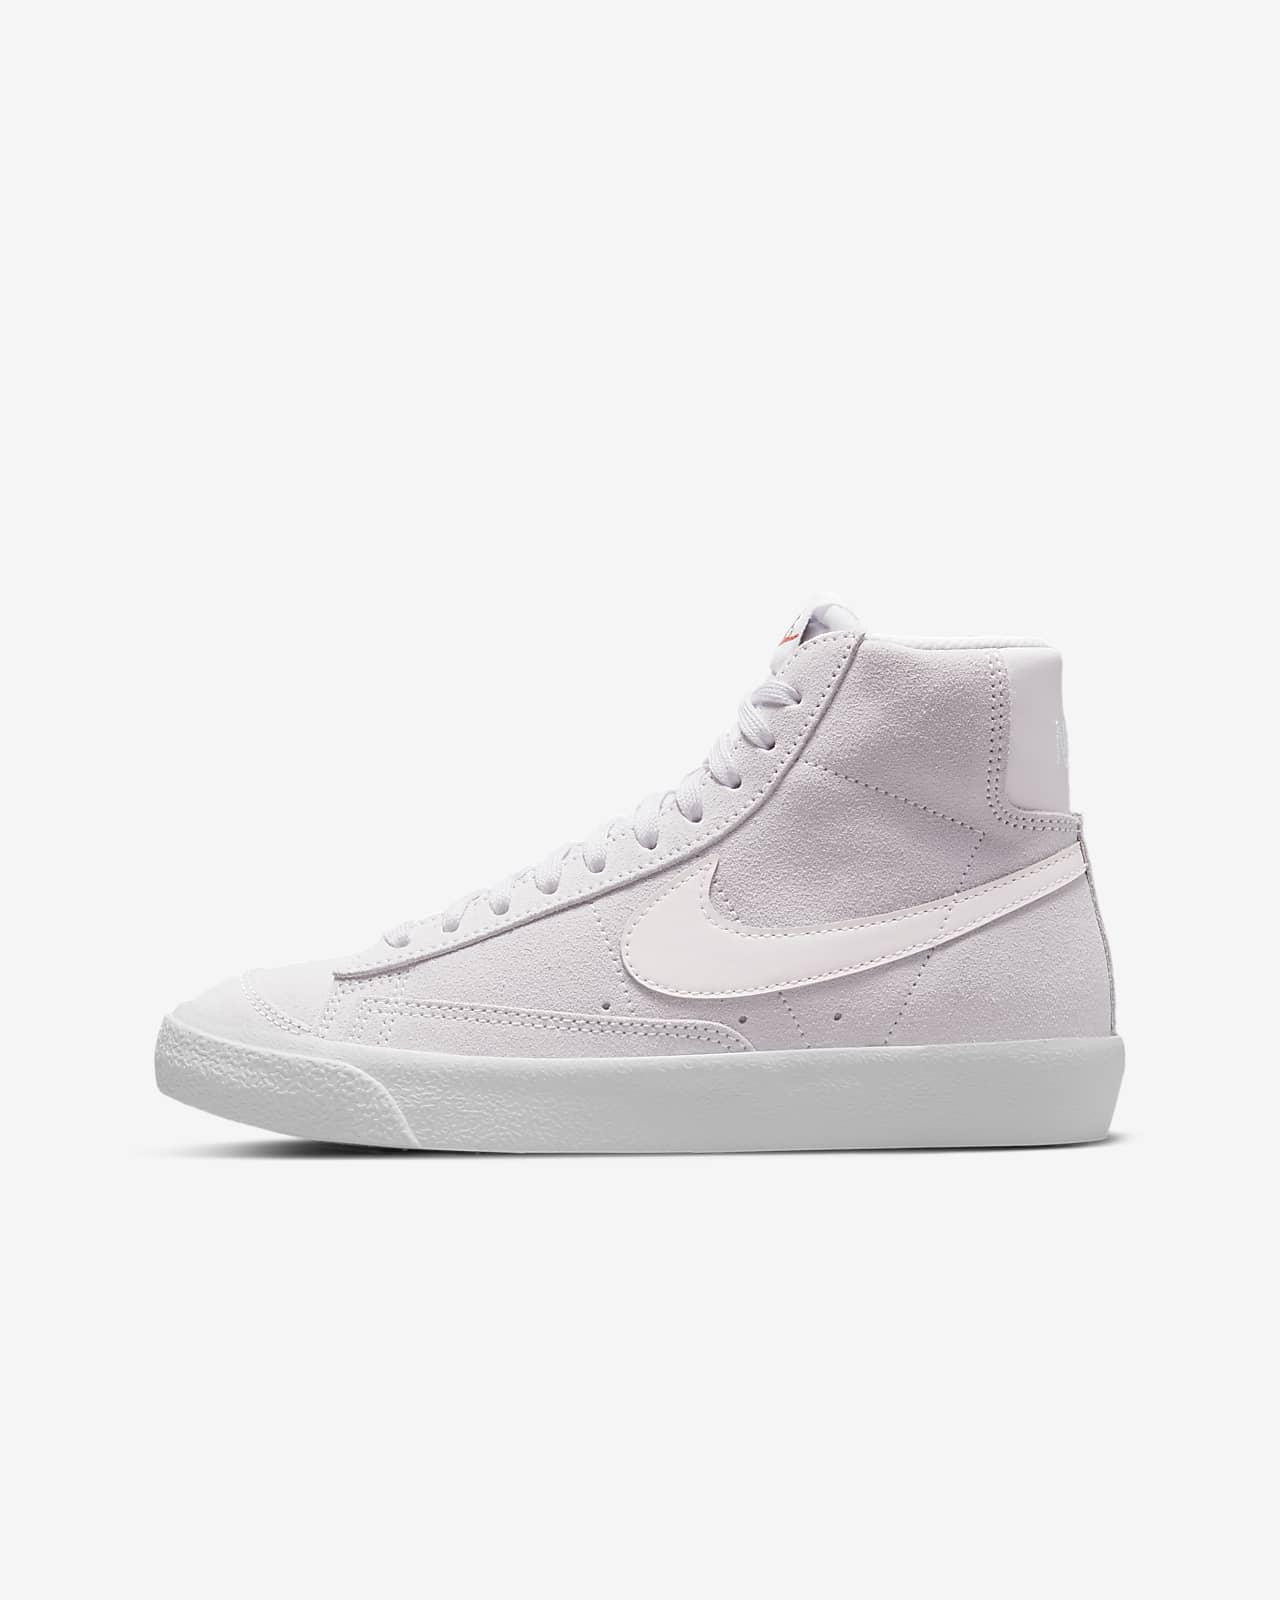 Nike Blazer Mid '77 Suede Big Kids' Shoes